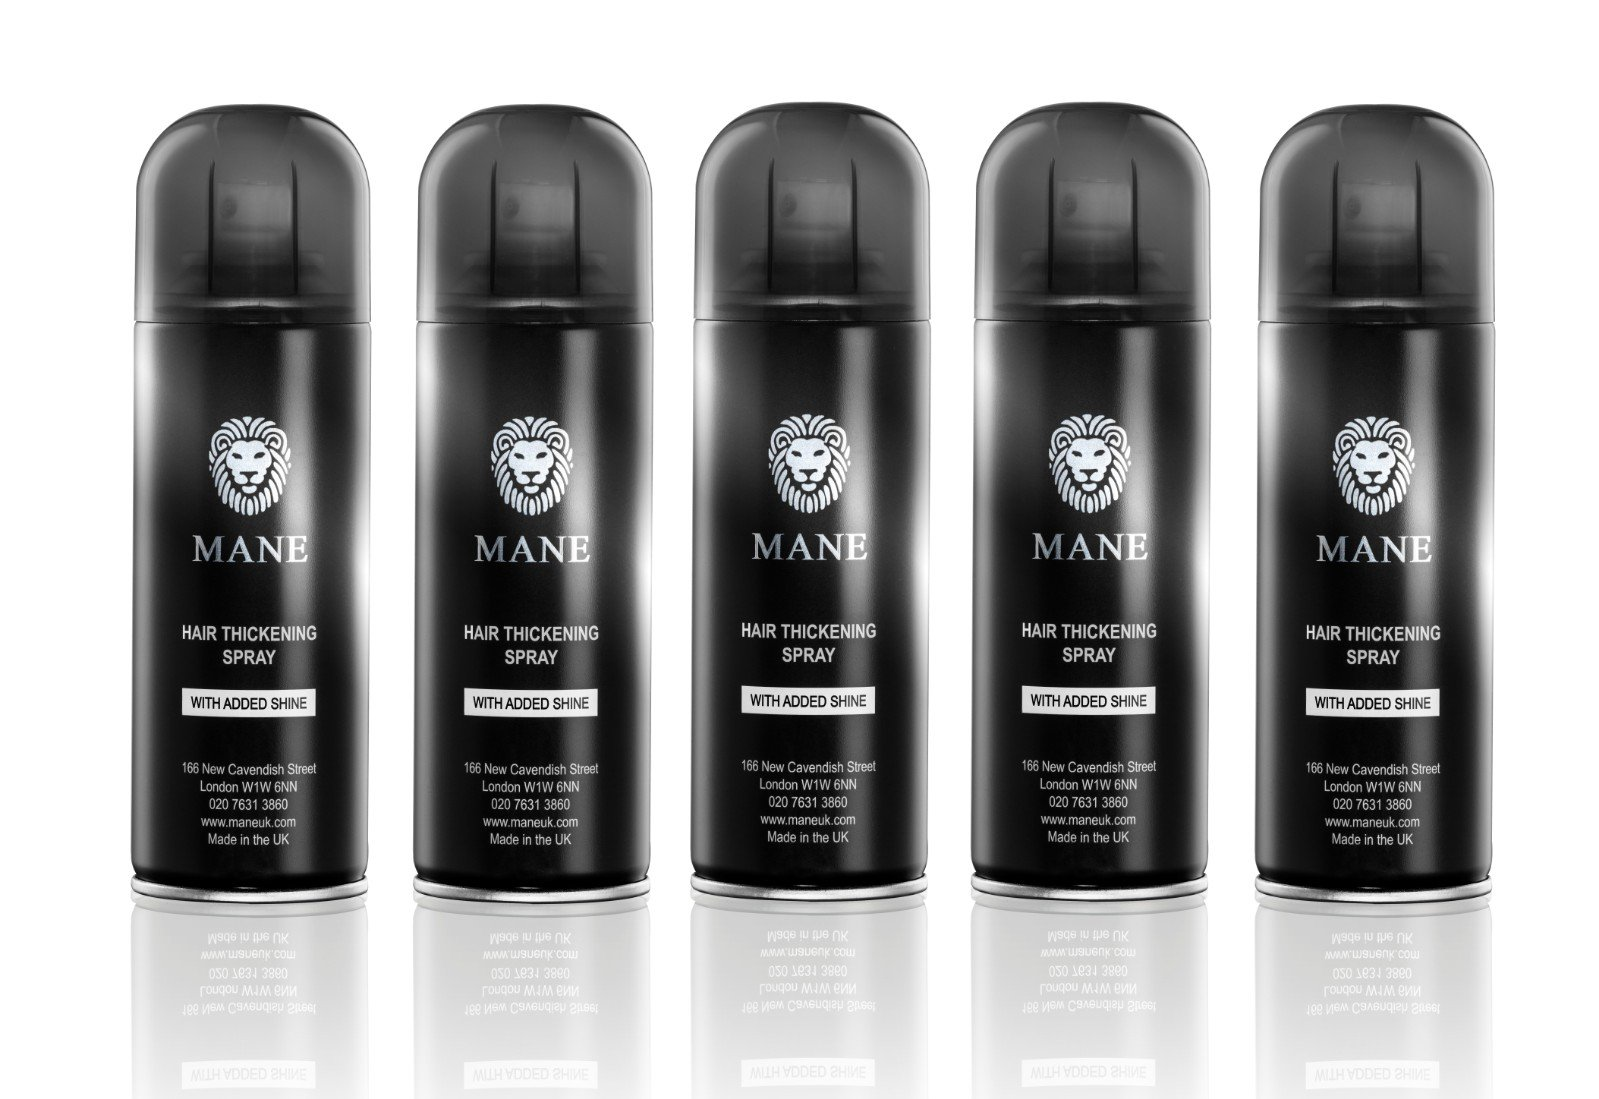 Mane America Hair Thickening Spray with Added Shine (5 Pack) (Grey)